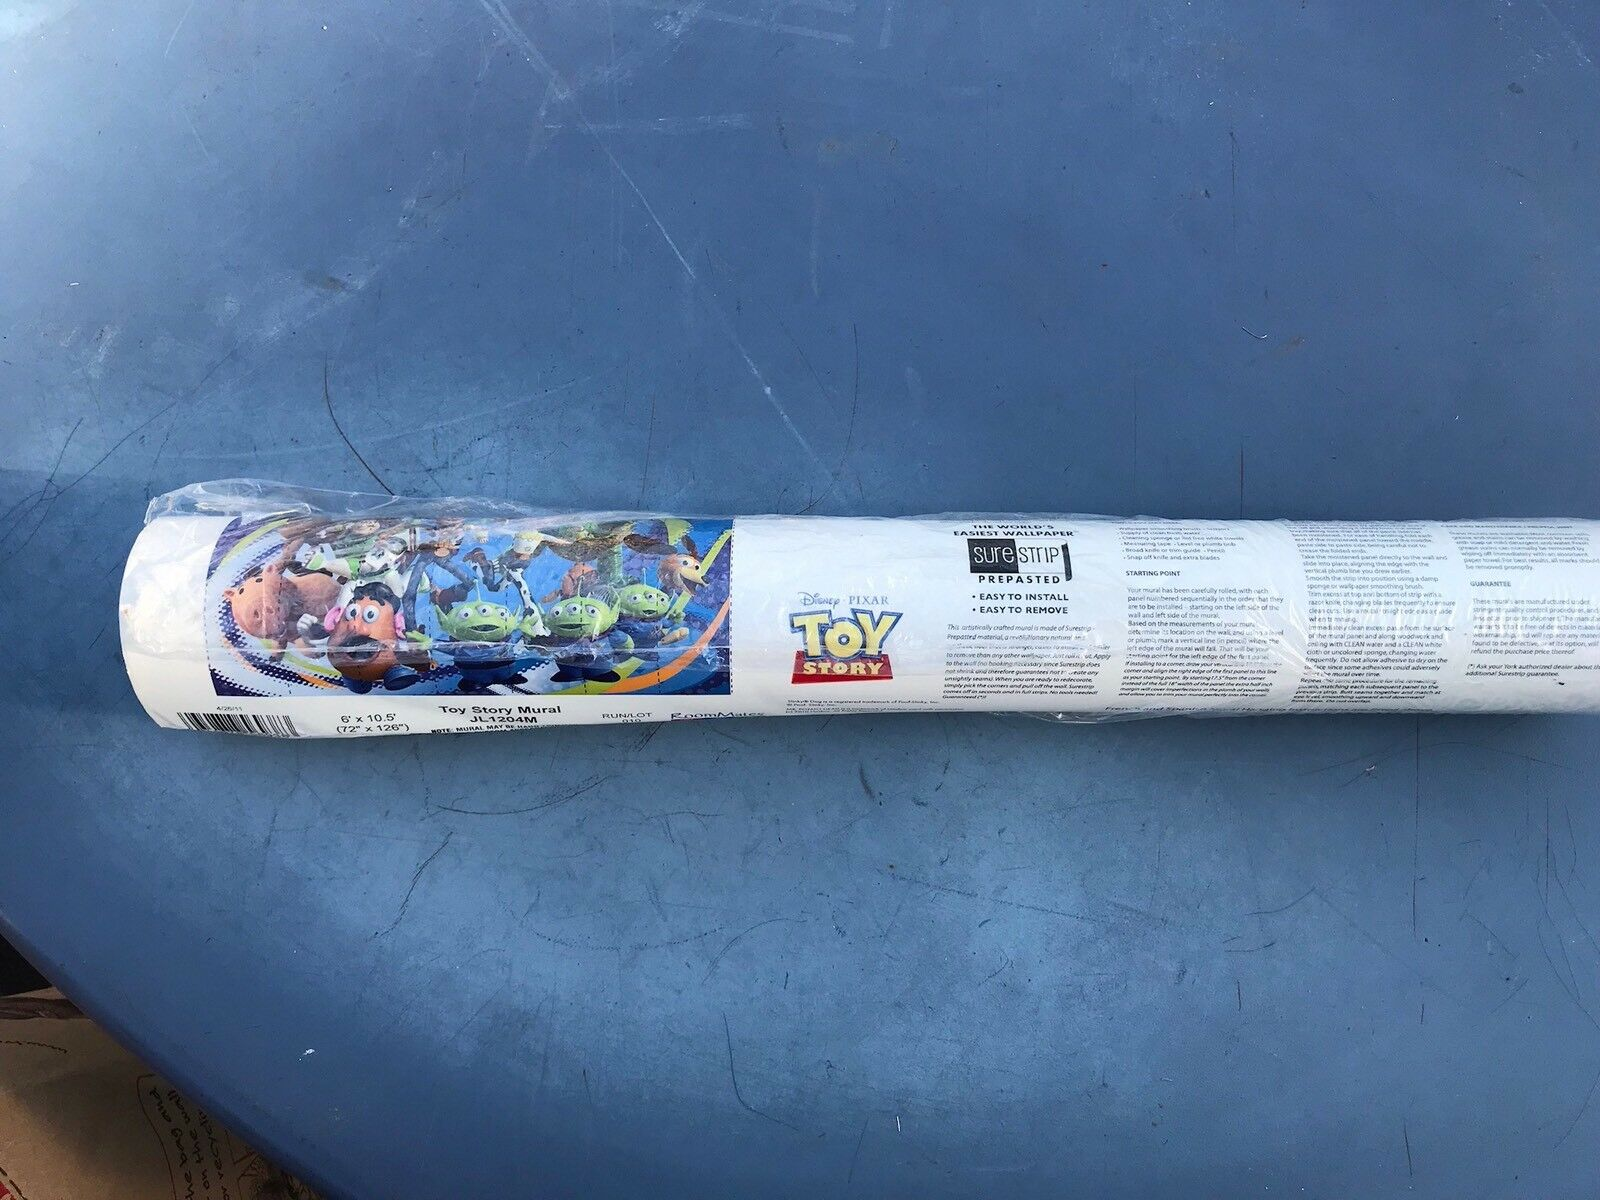 Toy Story moral JL1204M 6'x10.5'